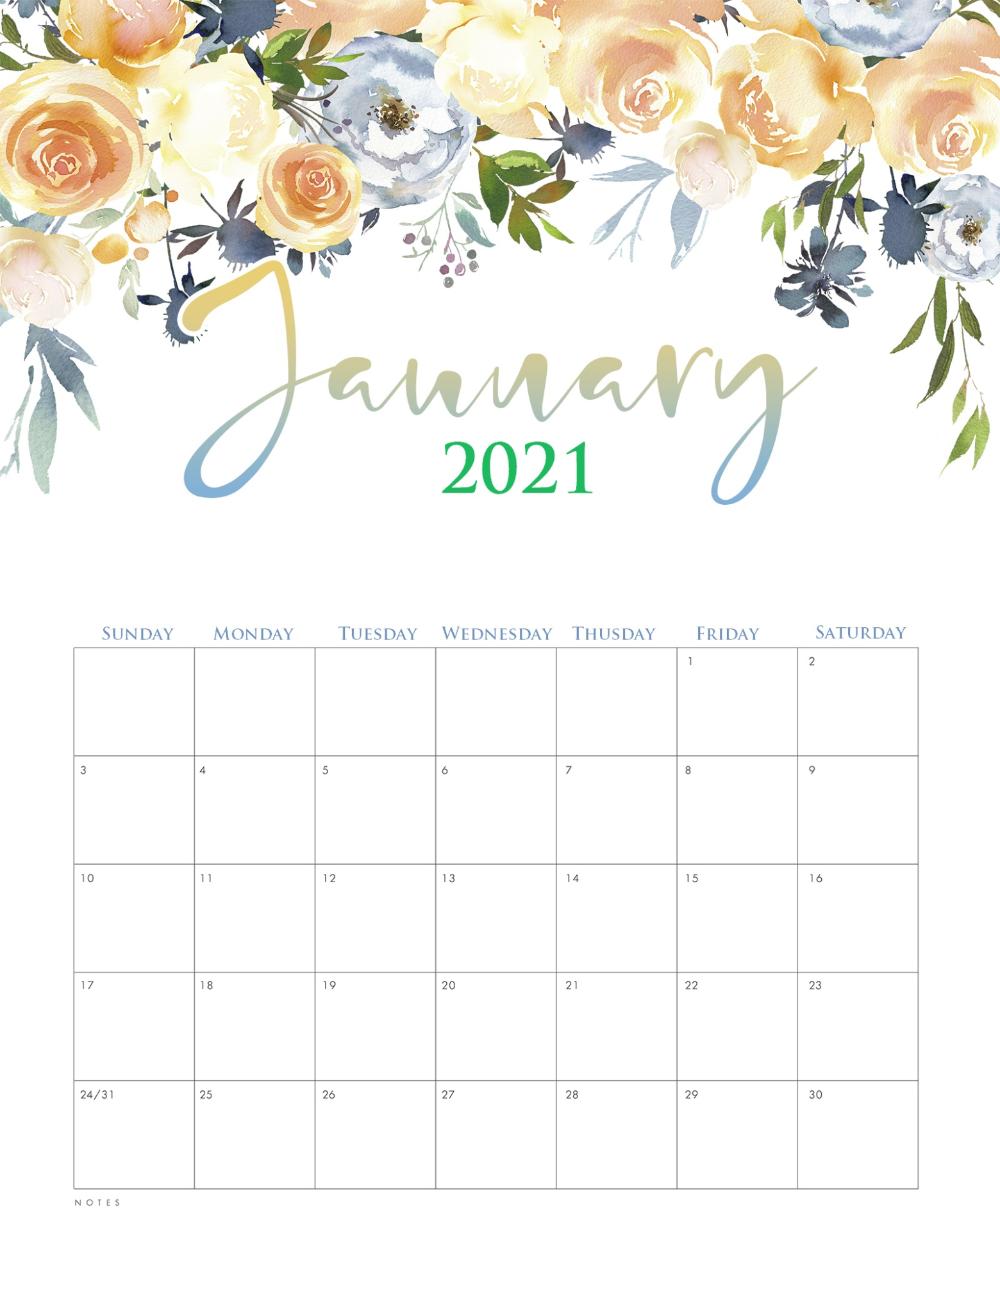 Cute January 2021 Calendar Template | Calendar printables ...